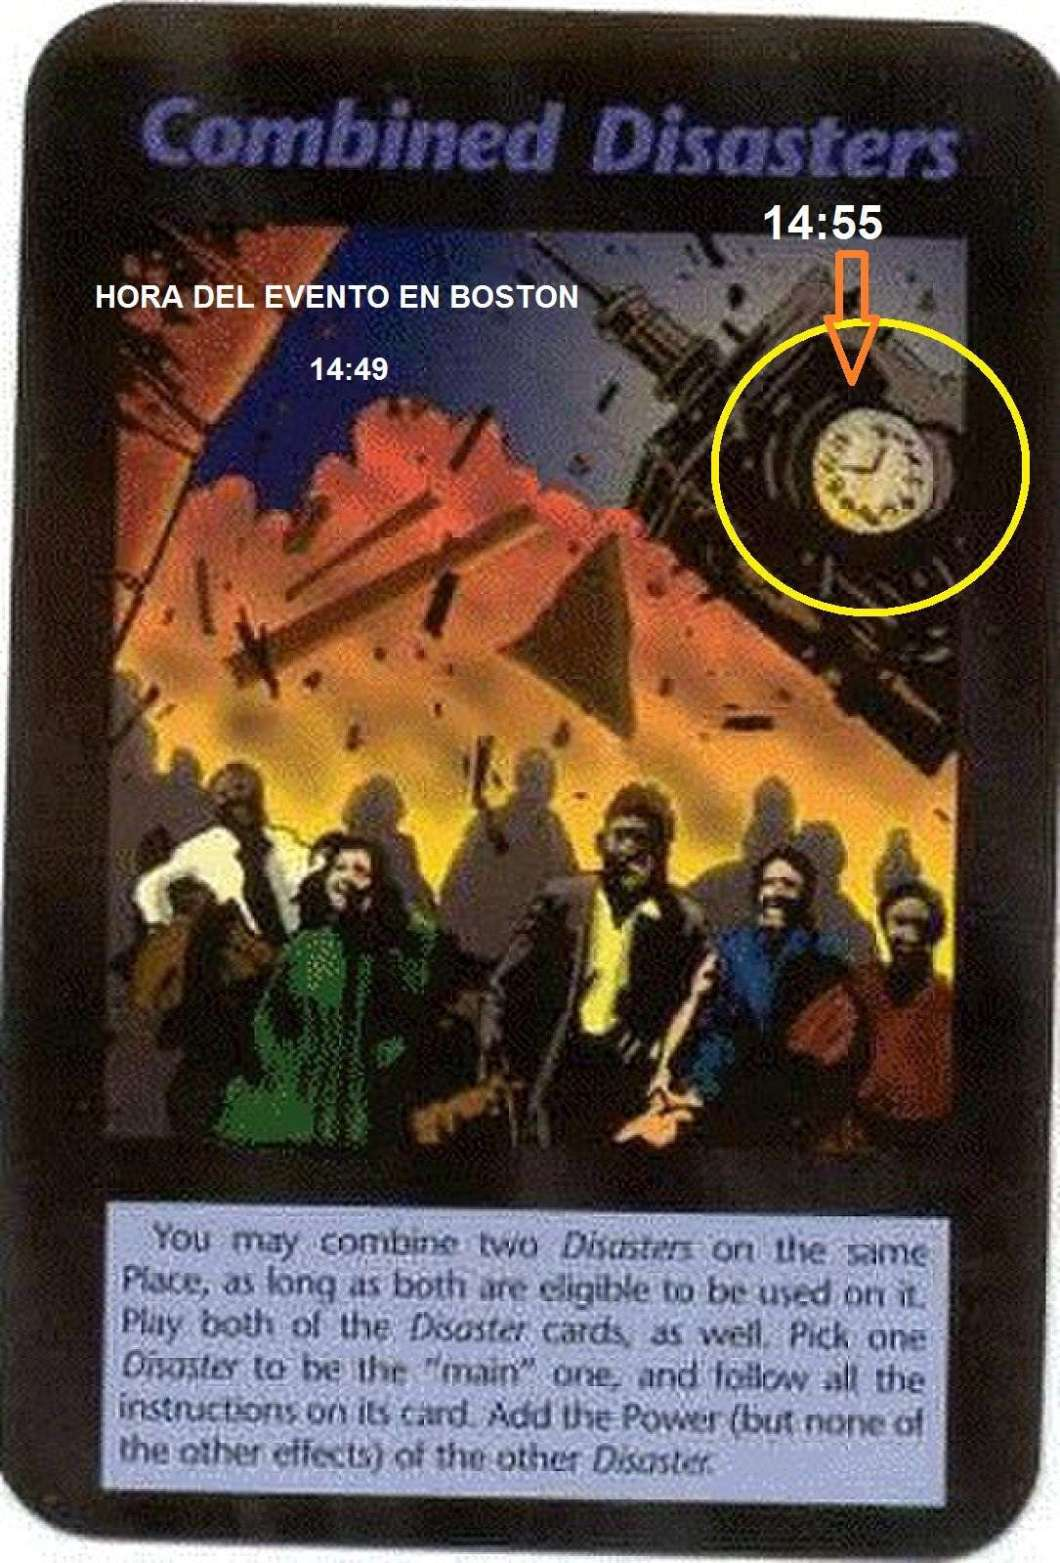 CARTA DESASTRES COMBINADOS BOSTON (HORA) (FILEminimizer)